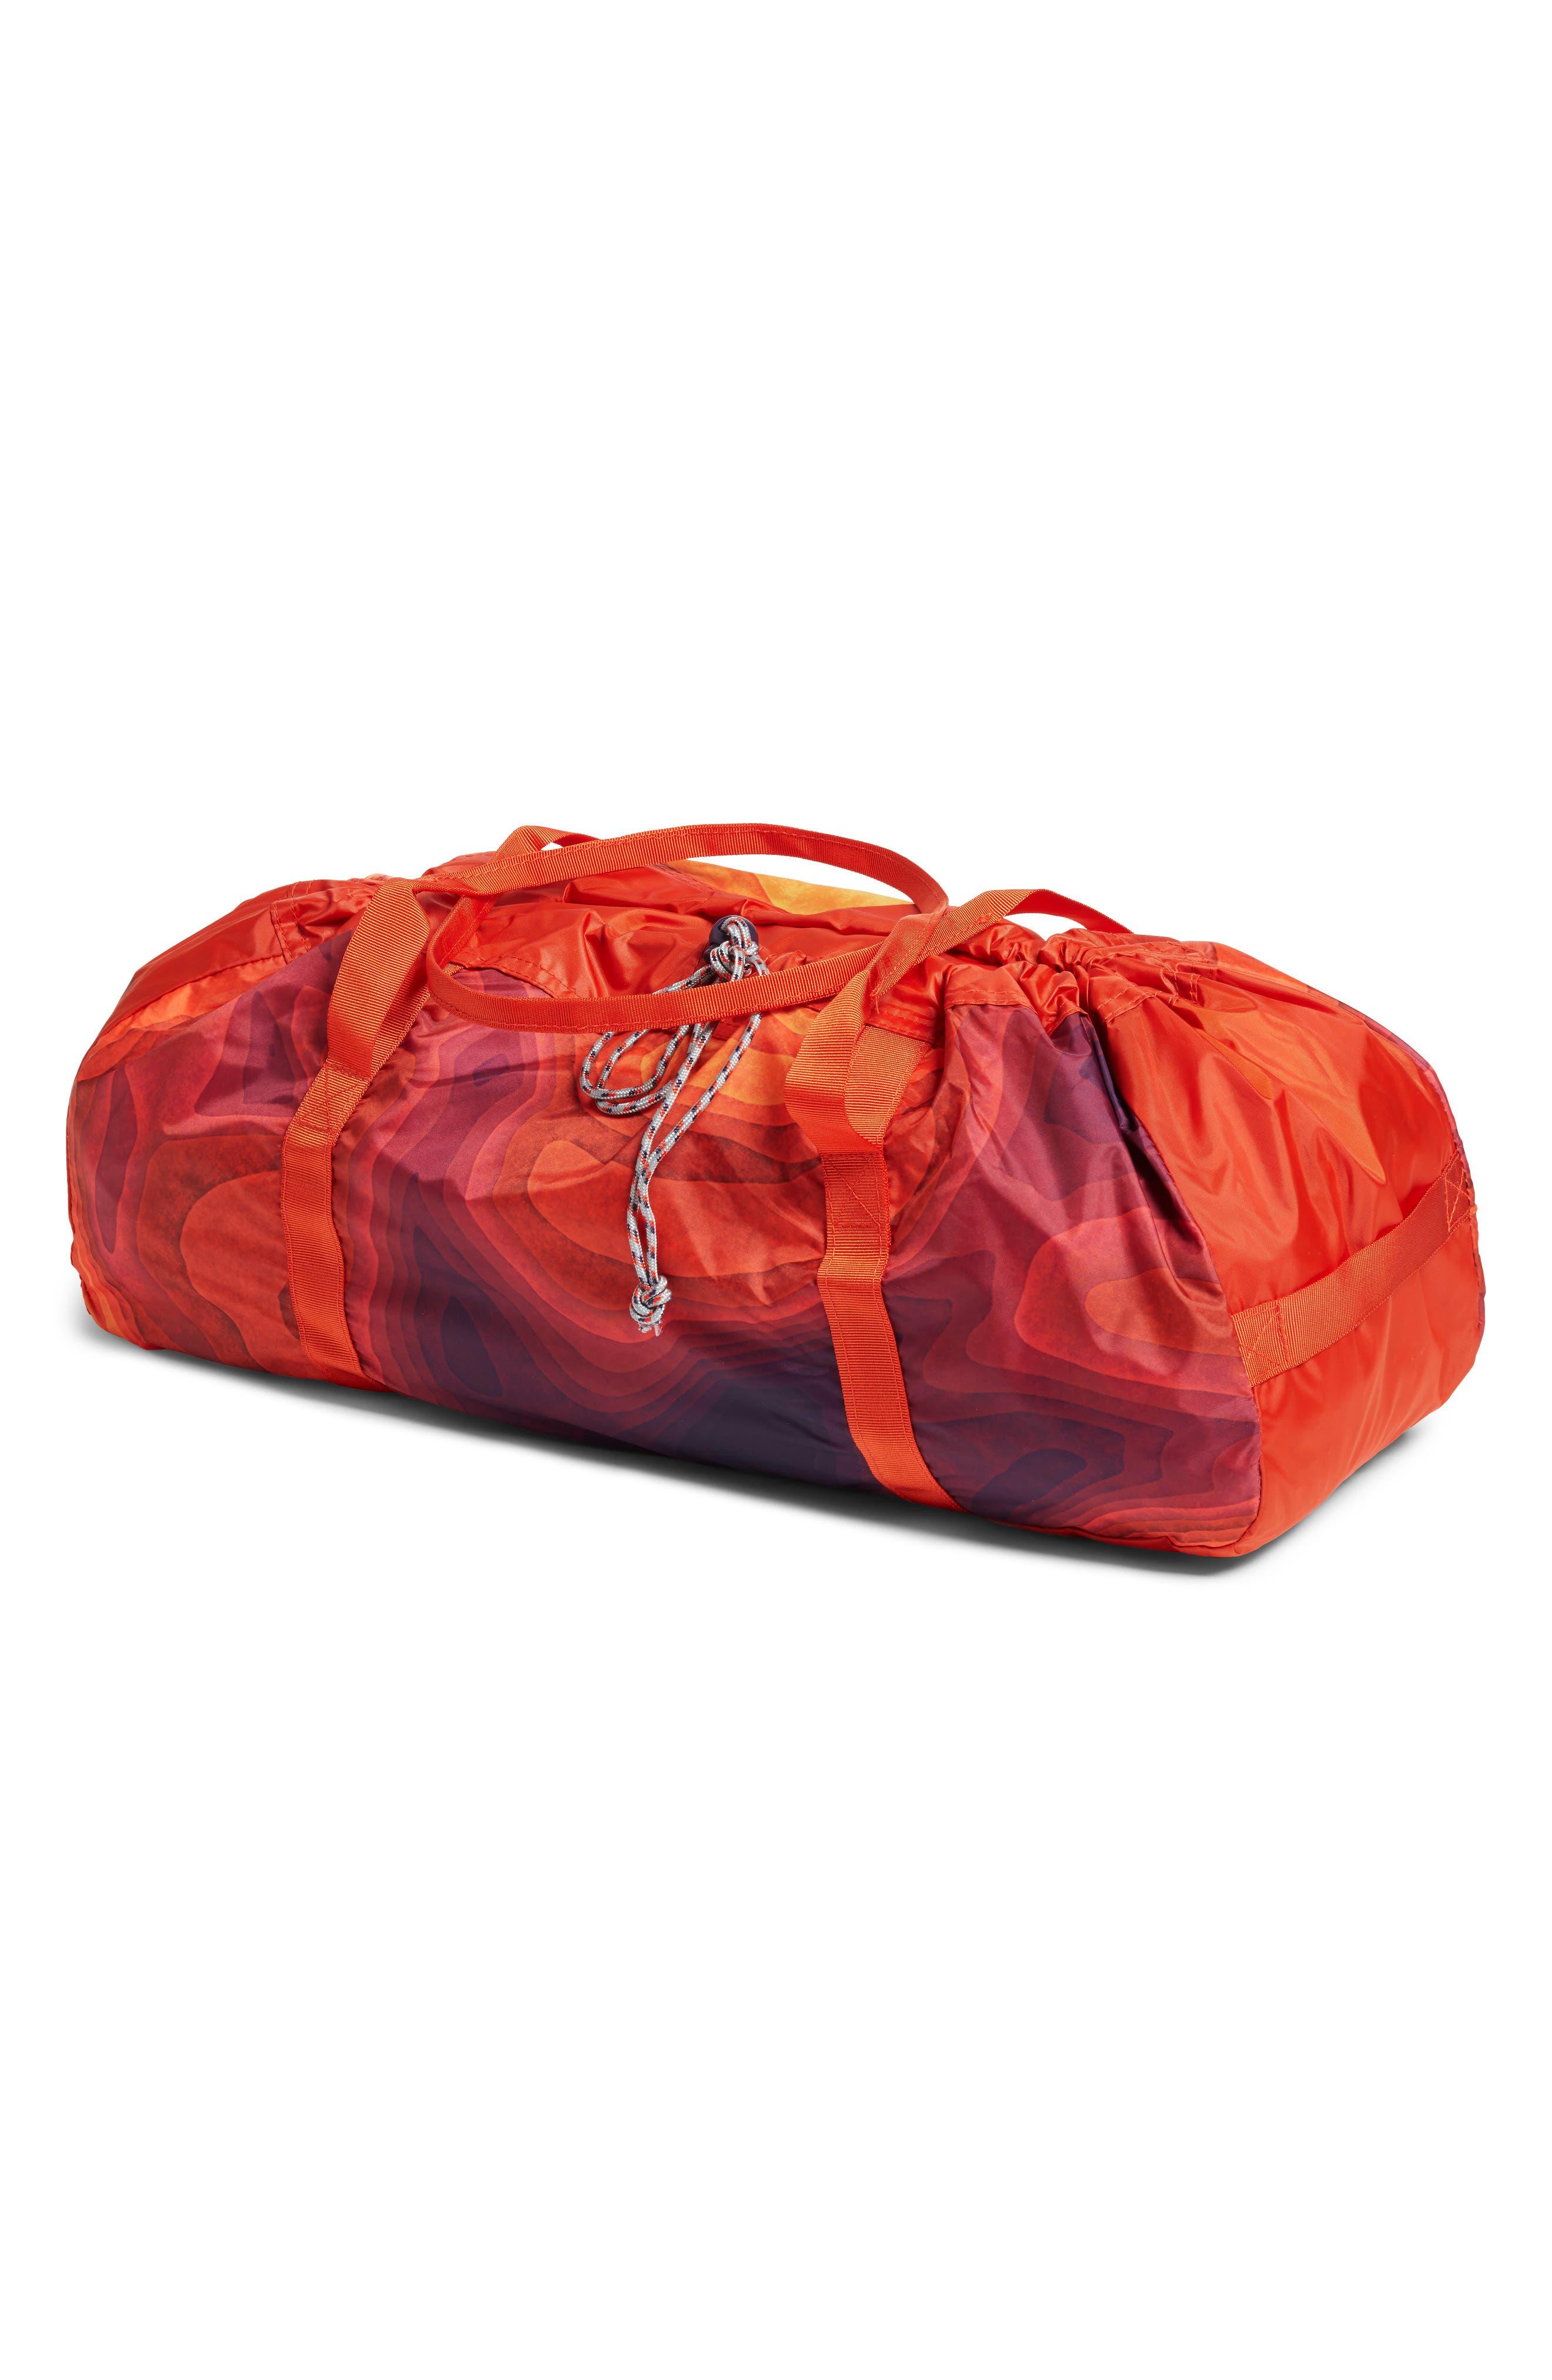 Homestead Roomy 2 Tent,                             Alternate thumbnail 2, color,                             Tibetan Orange/ High Rise Grey